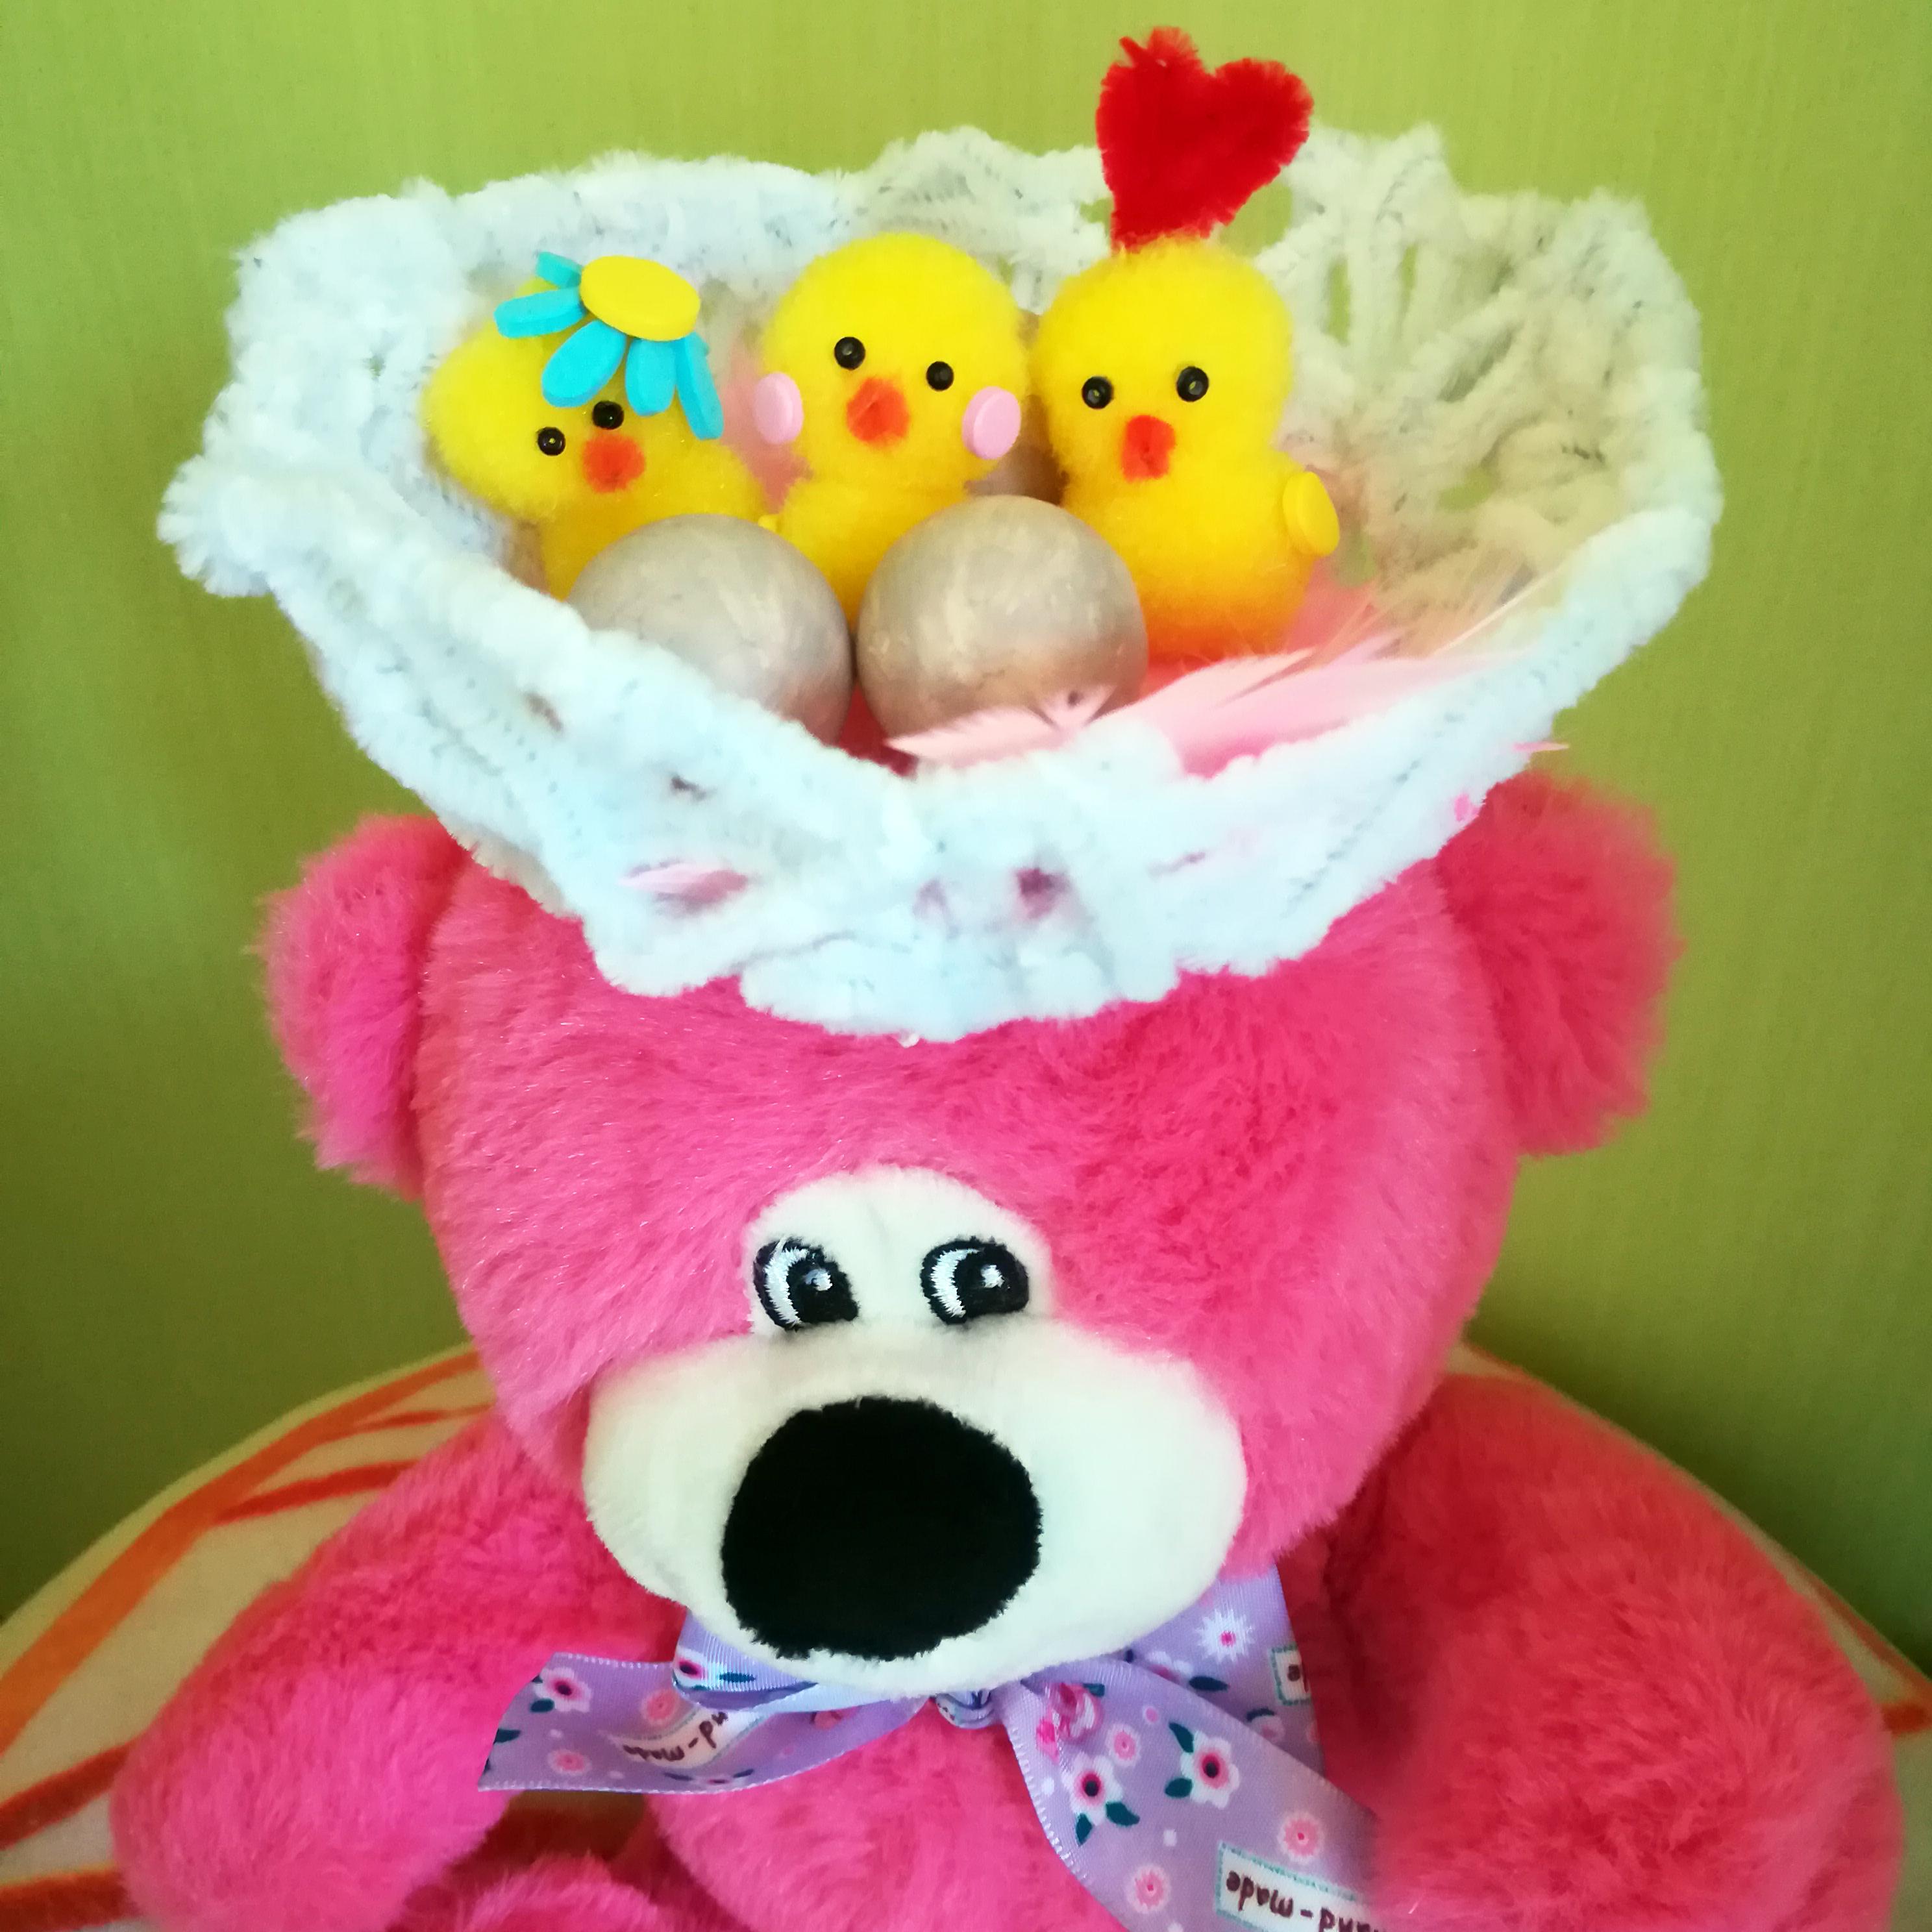 diy-tuto-idee-bricolage-chapeau-nid-poussin-oiseau-oeuf-paques-deguisement